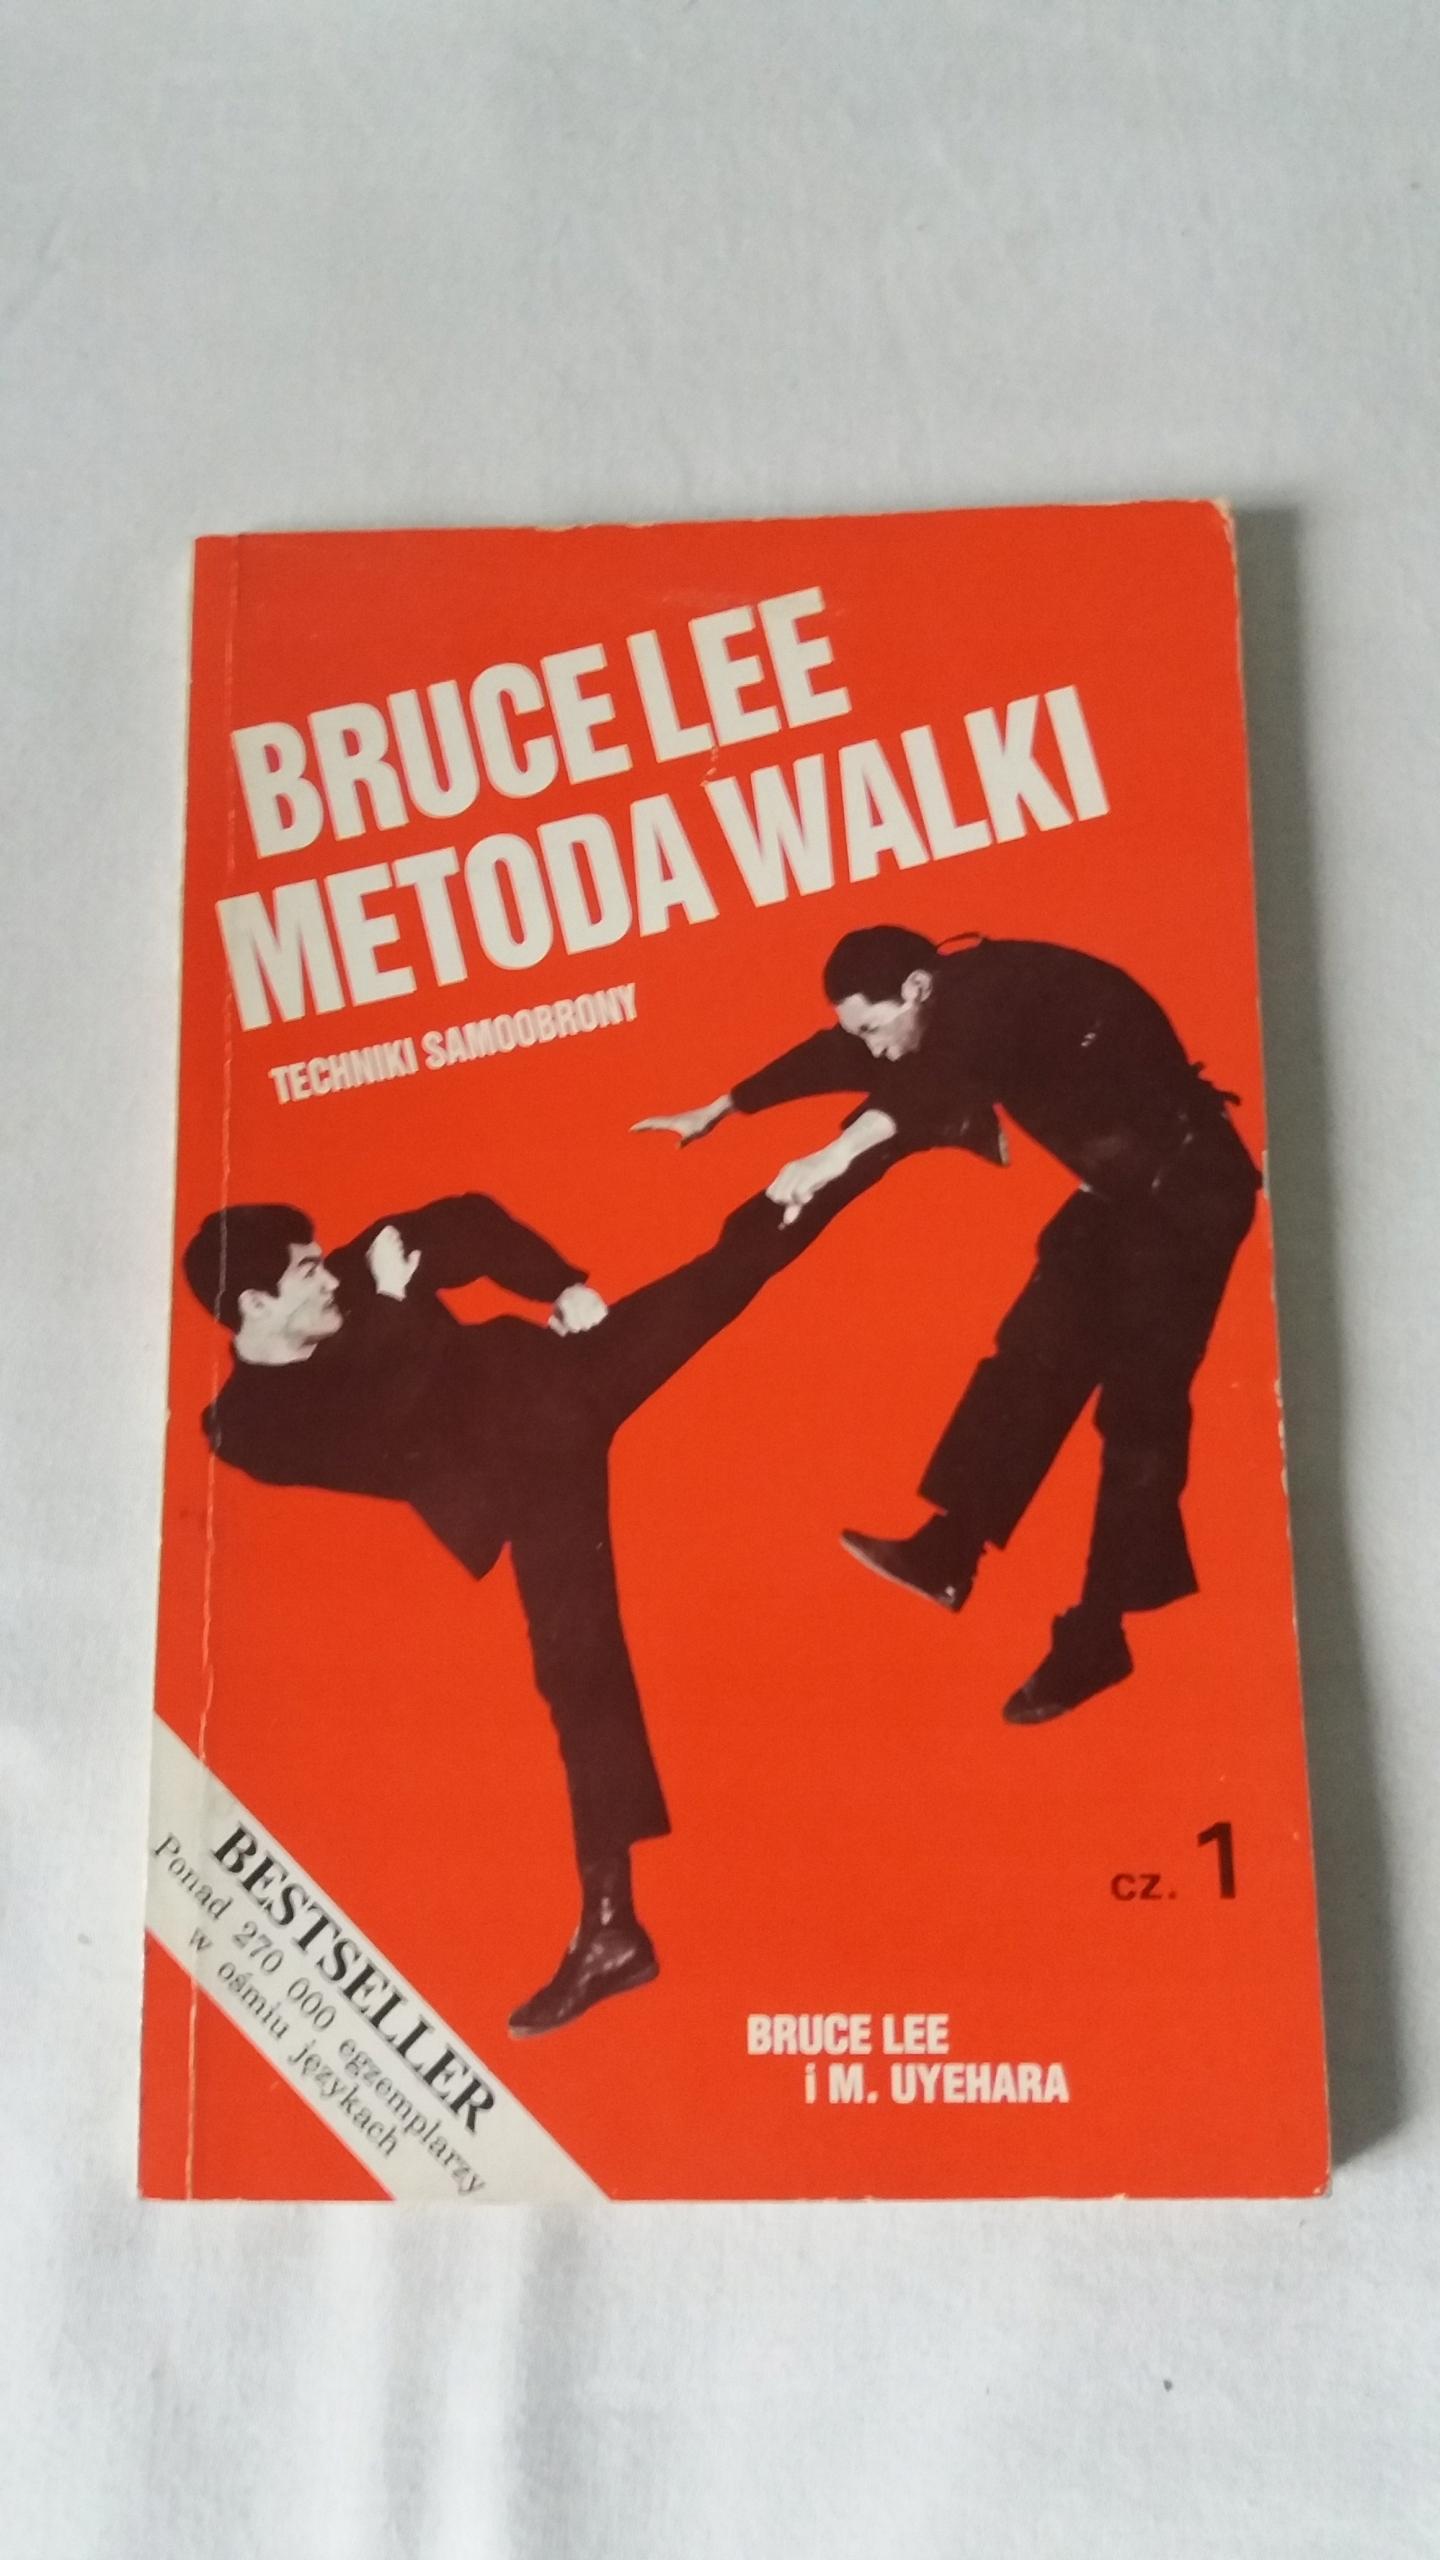 Bruce Lee - Metoda walki: techniki samoobrony